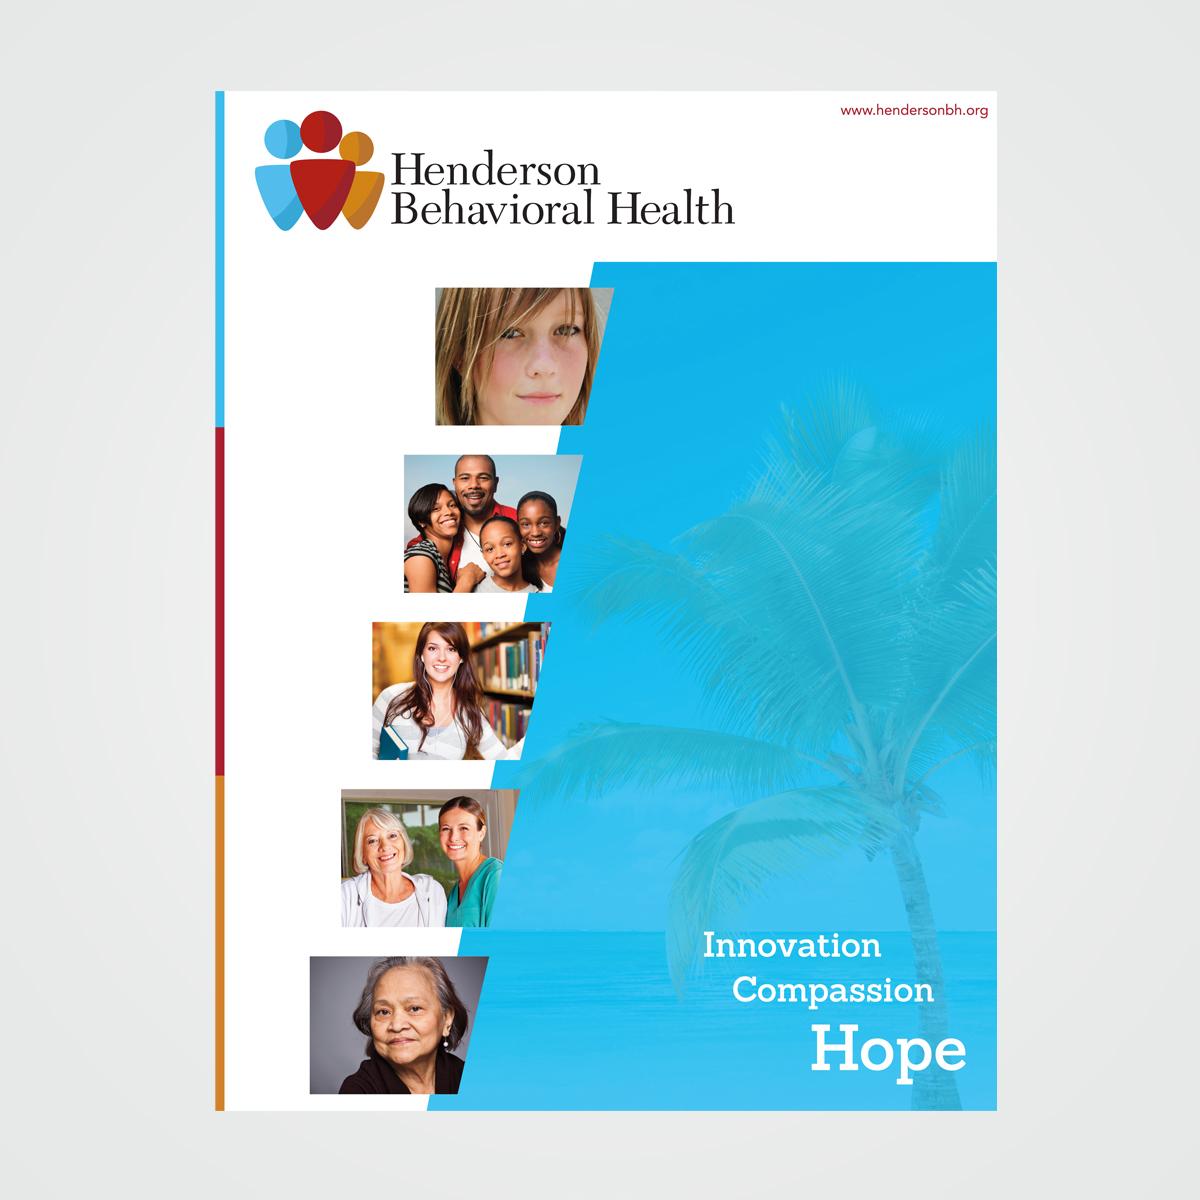 Brochure design for Henderson Behavioral Health, the largest behavioral health organization in South Florida